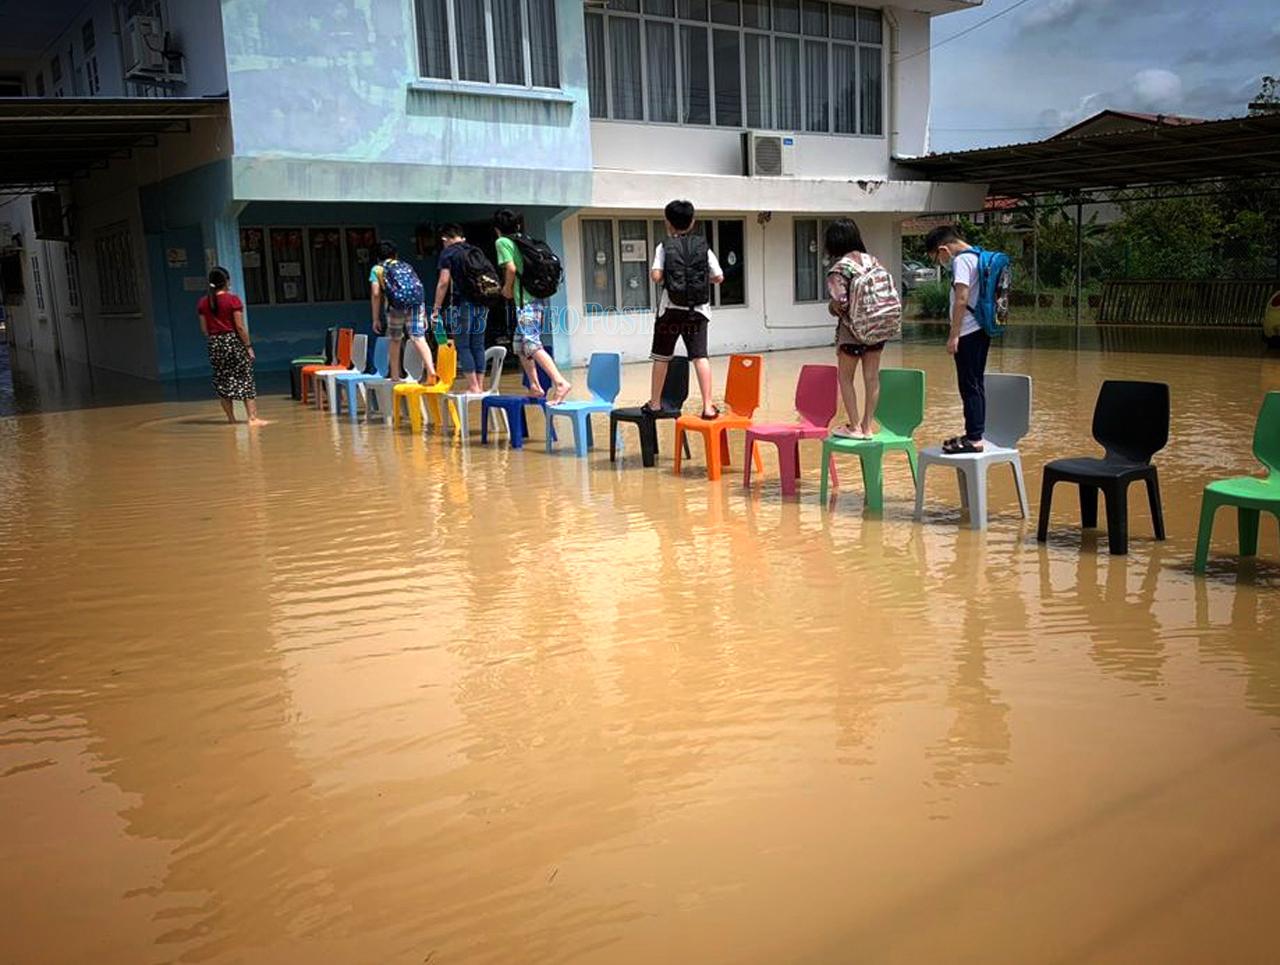 School children walk on chairs to avoid getting wet. — Picture via WhatsApp